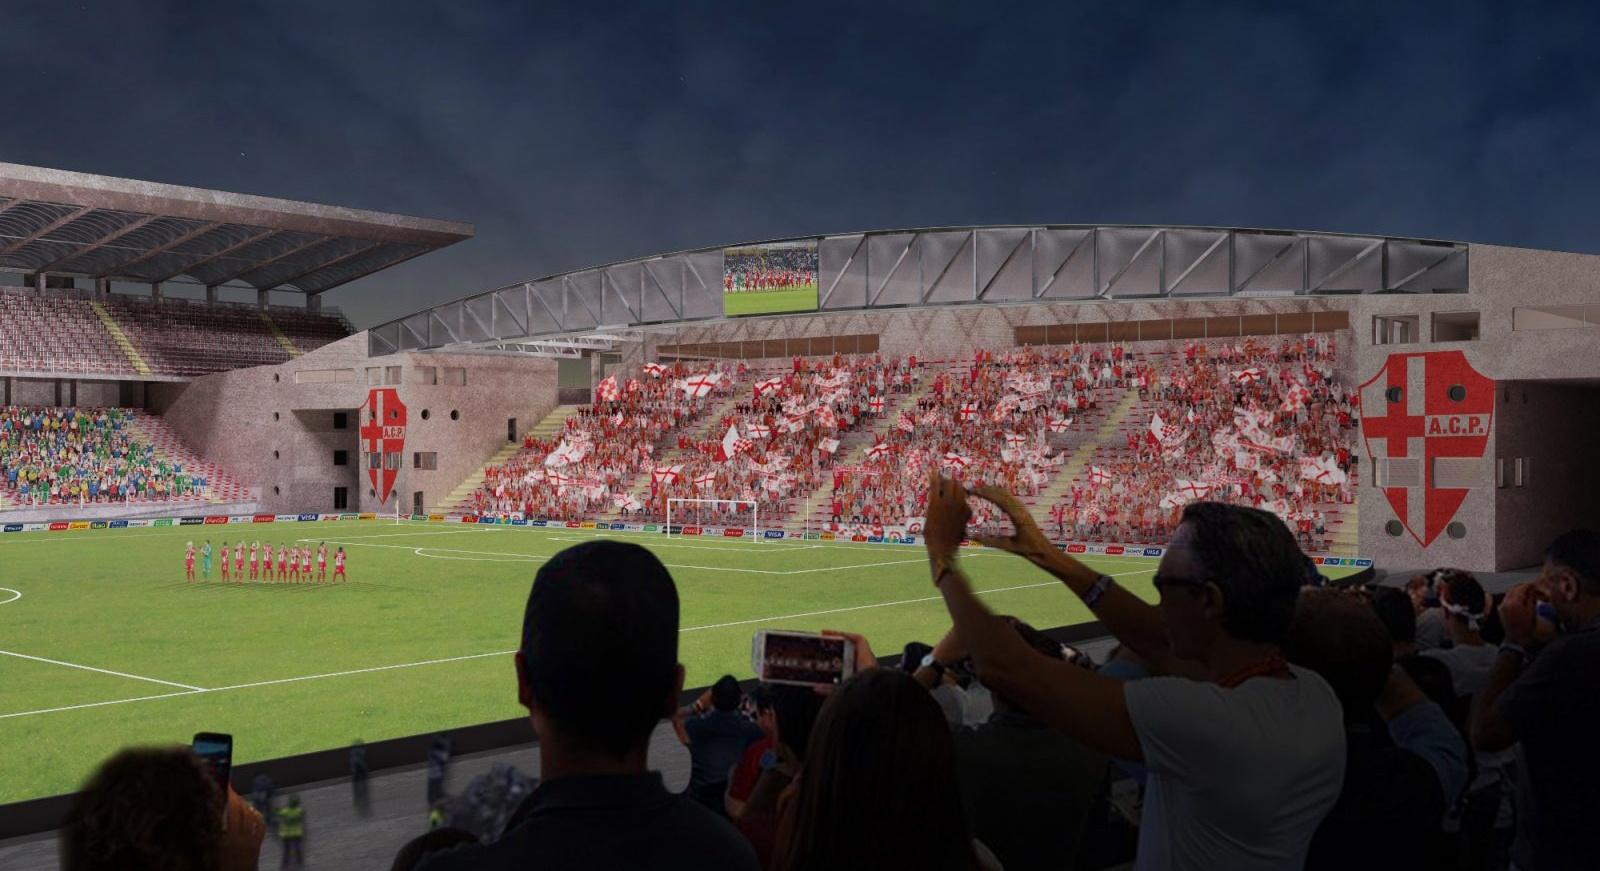 Stadio Euganeo reconstruction